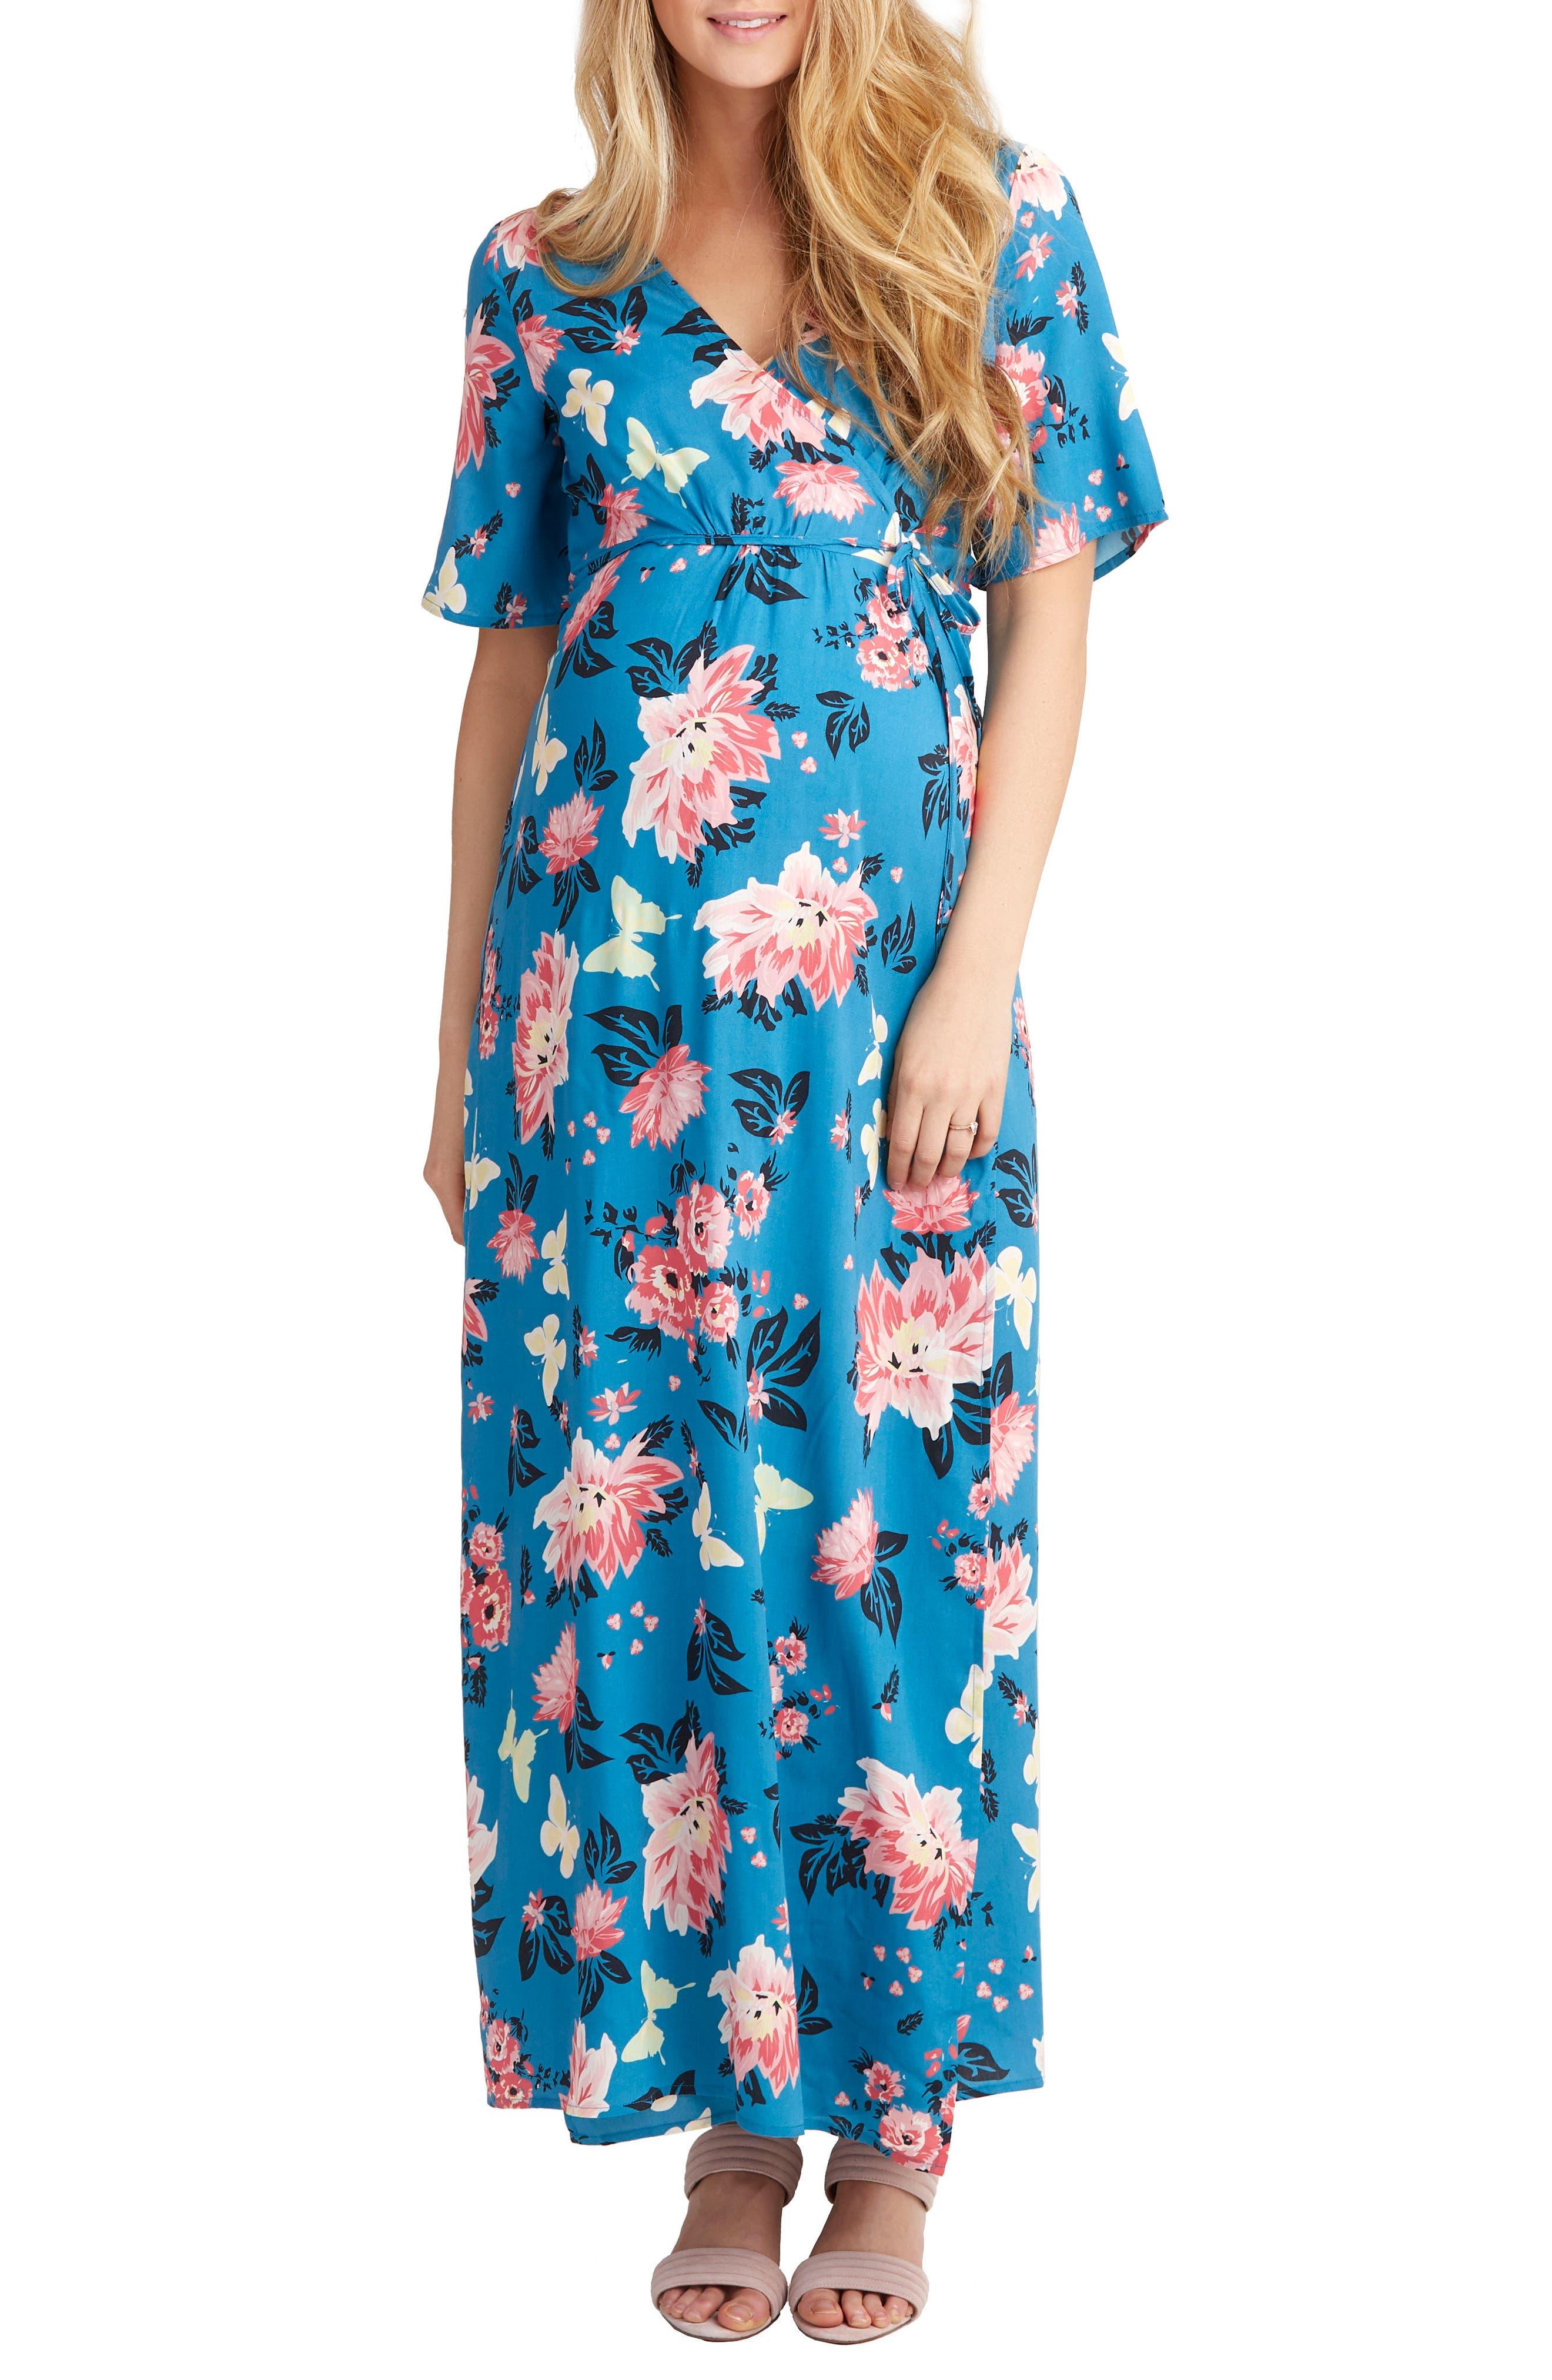 Nom Maternity Landon Maxi Wrap Maternity/nursing Dress, Blue